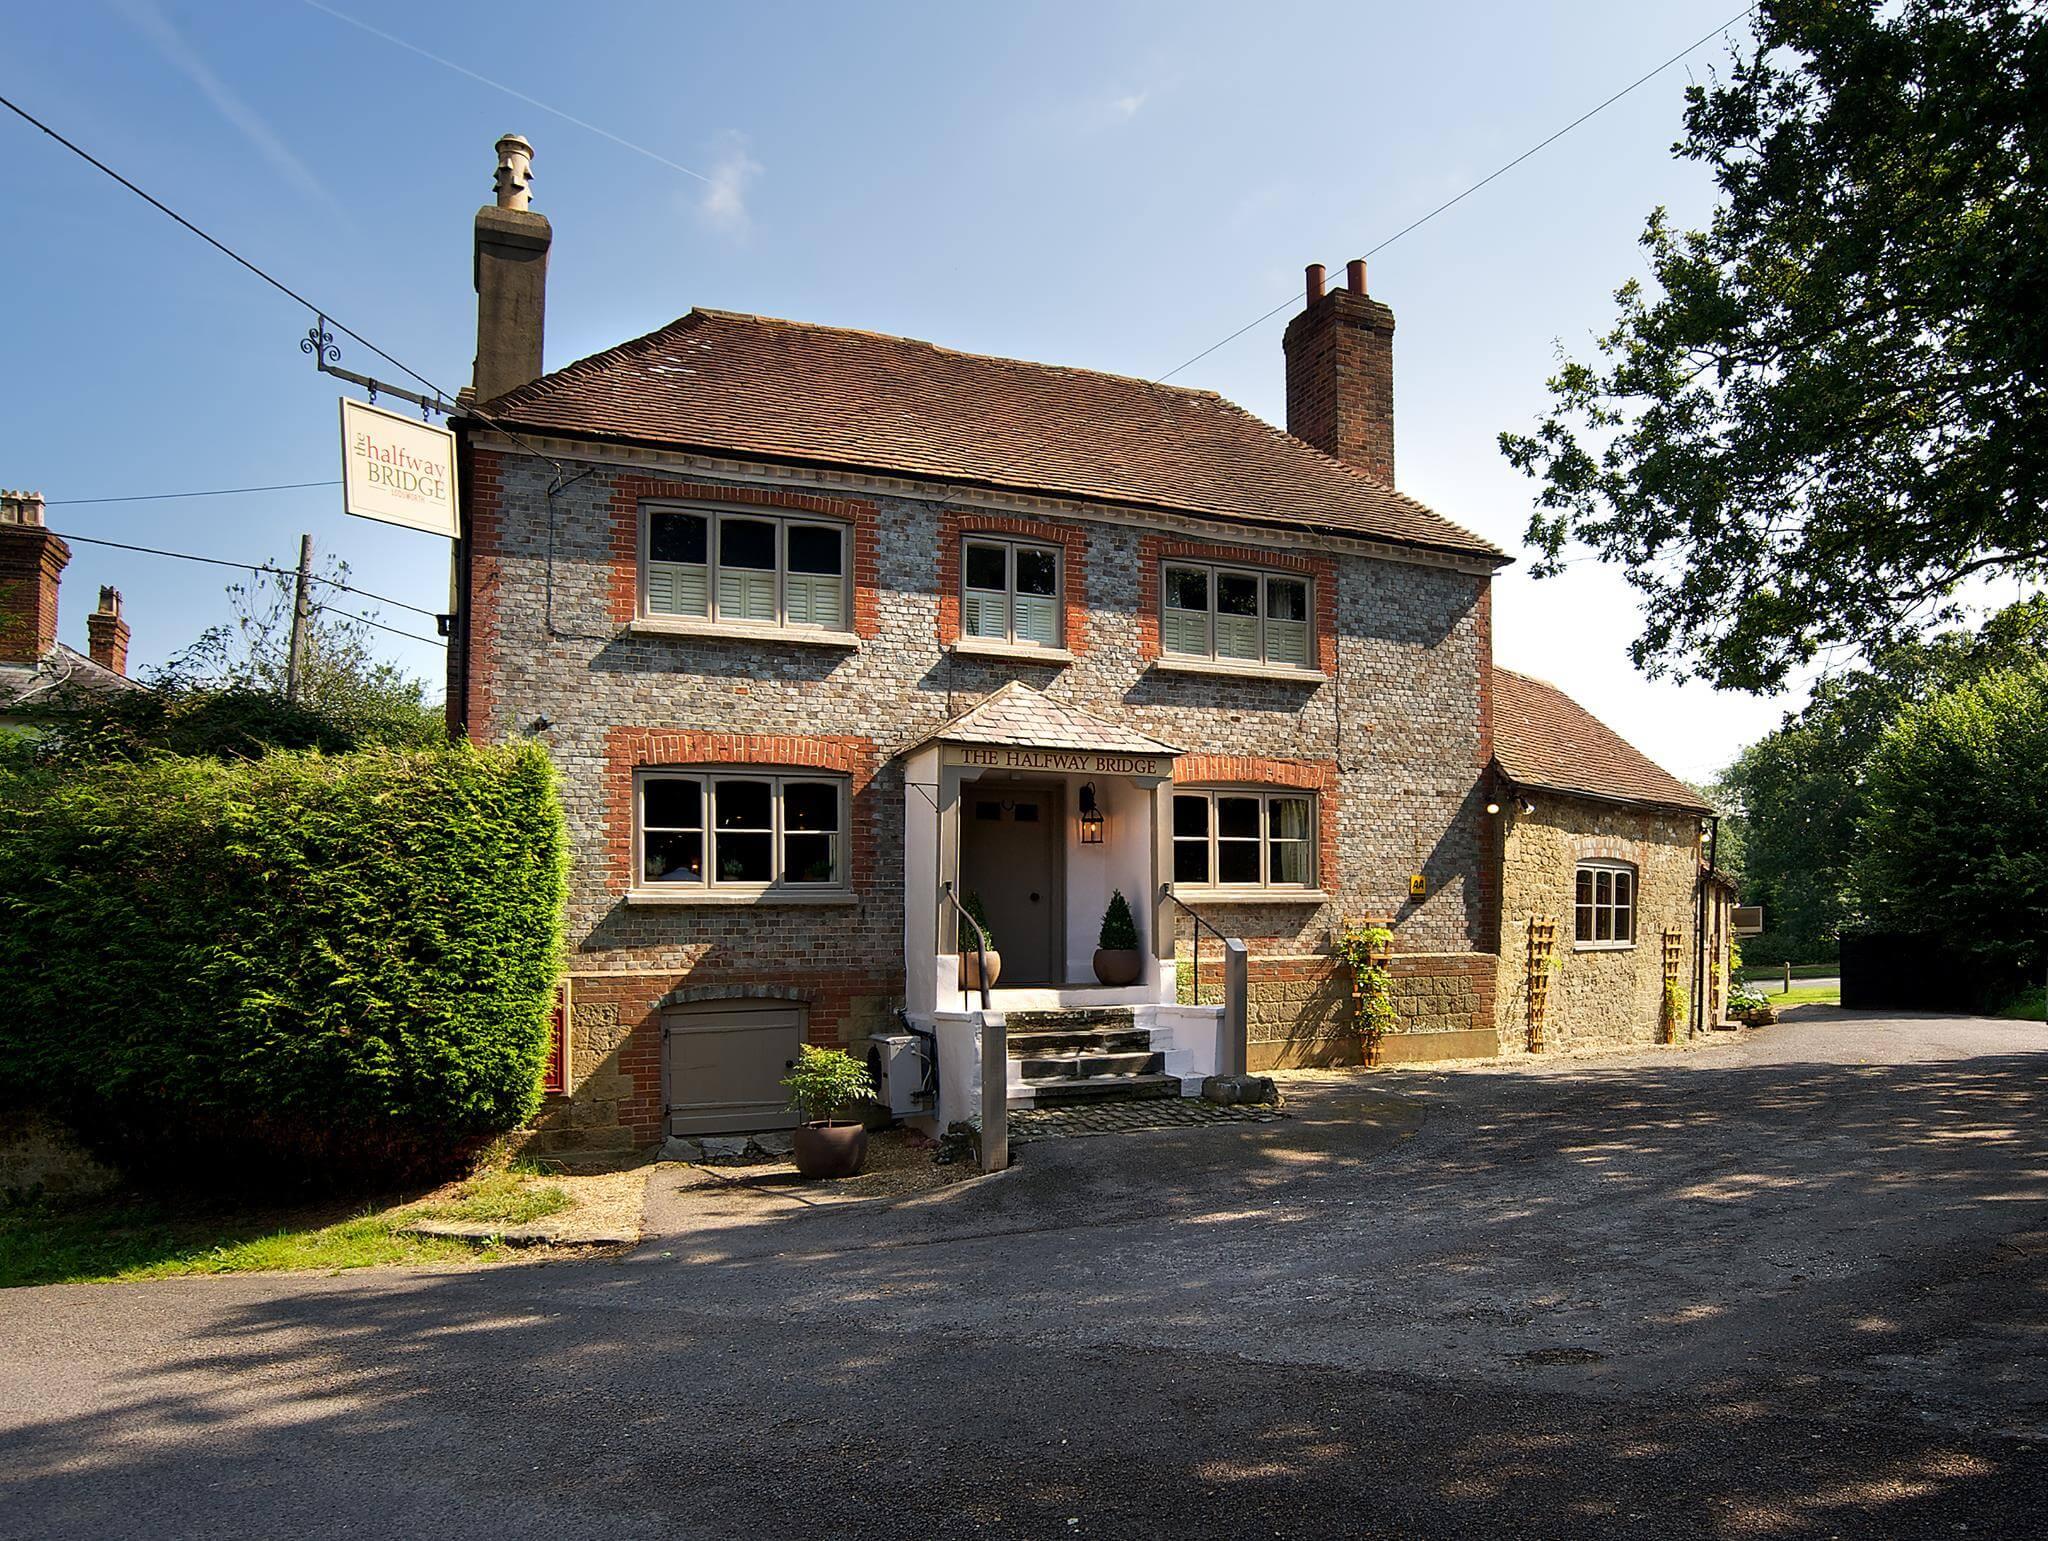 The Halfway Bridge Inn | The Mustcard